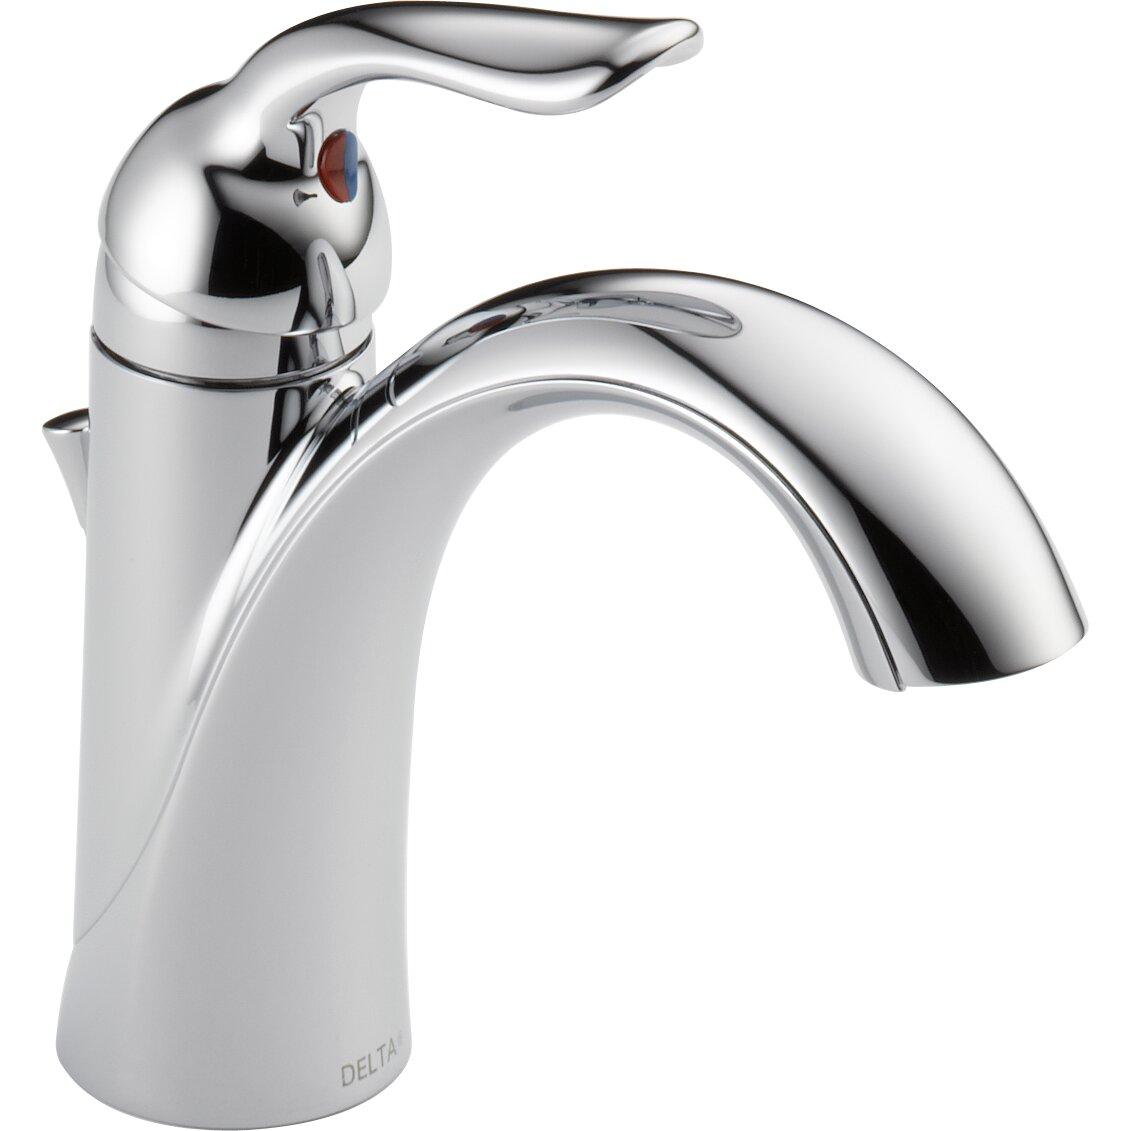 Delta Lahara Standard Bathroom Faucet Lever Handle